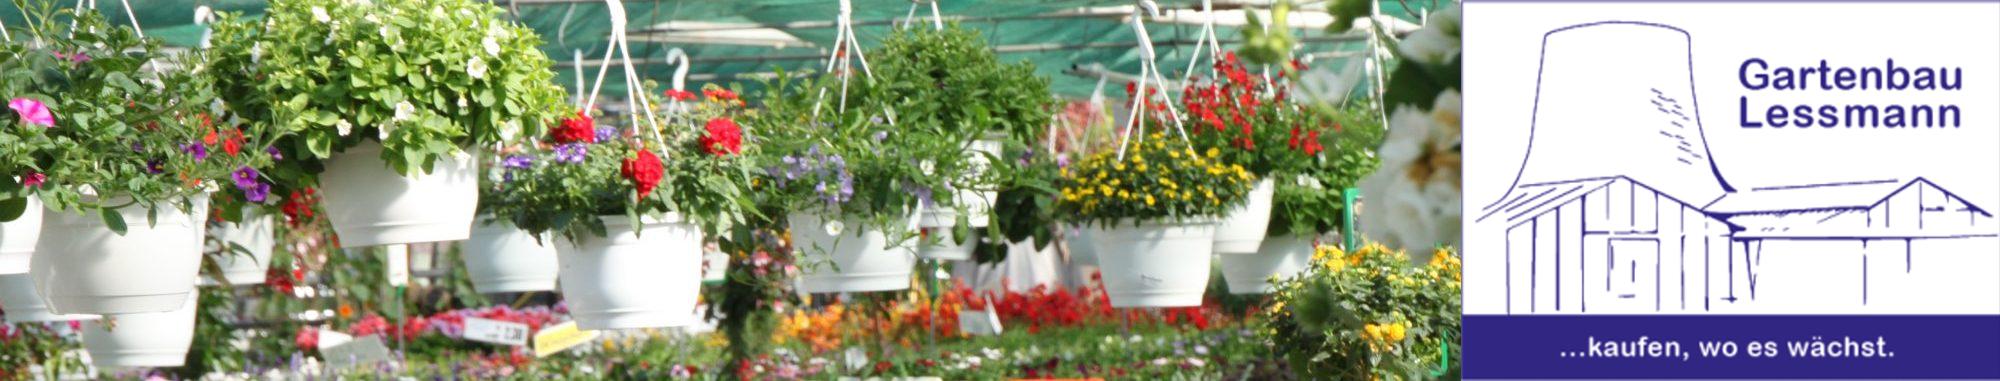 Gartenbau Lessmann